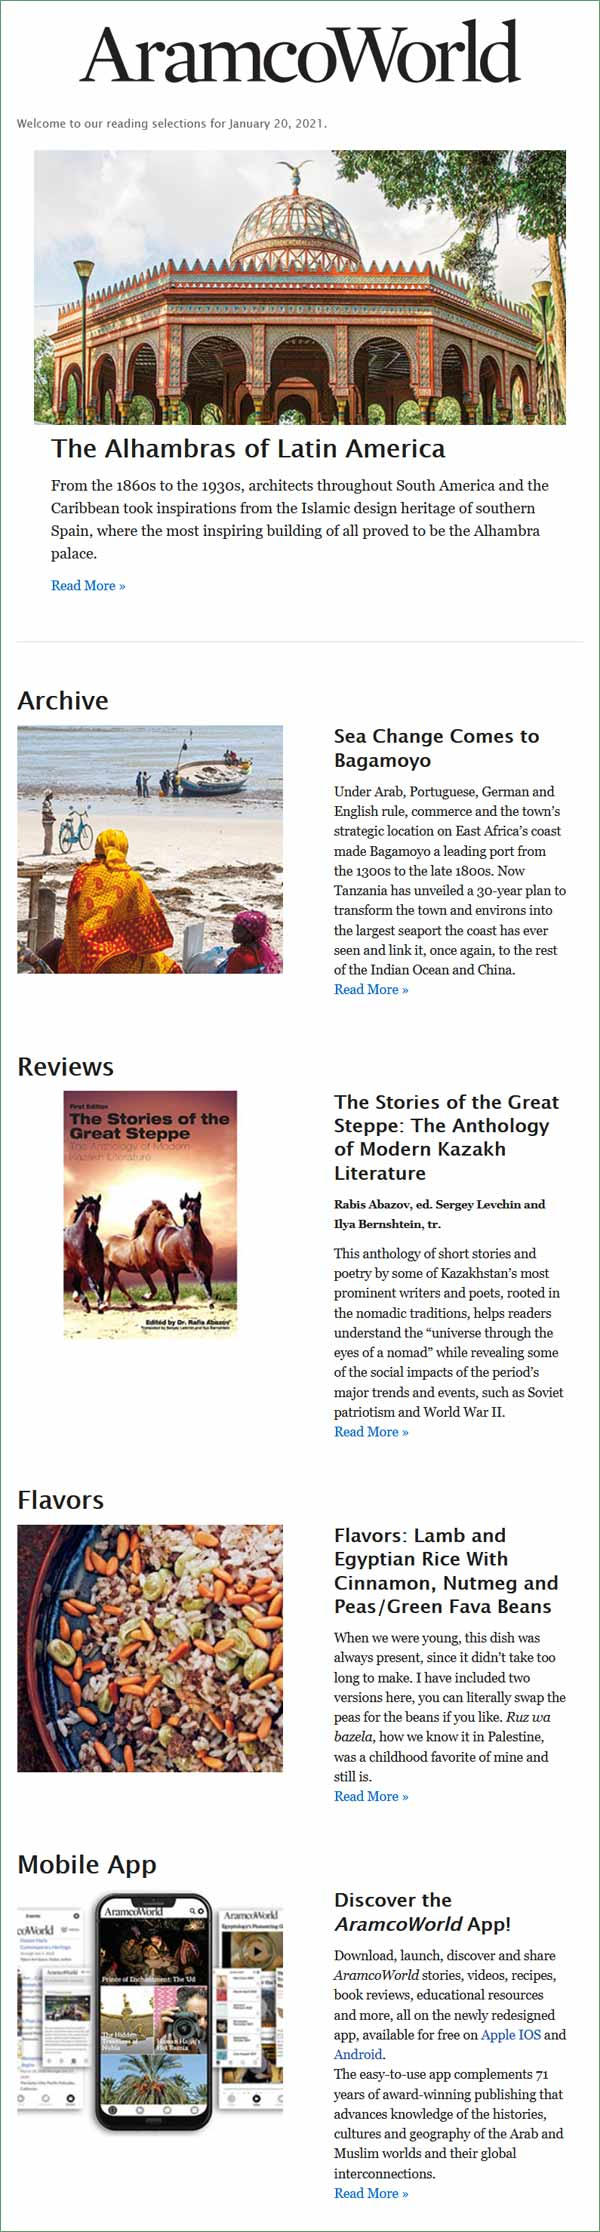 AramcoWorld Reading Selections